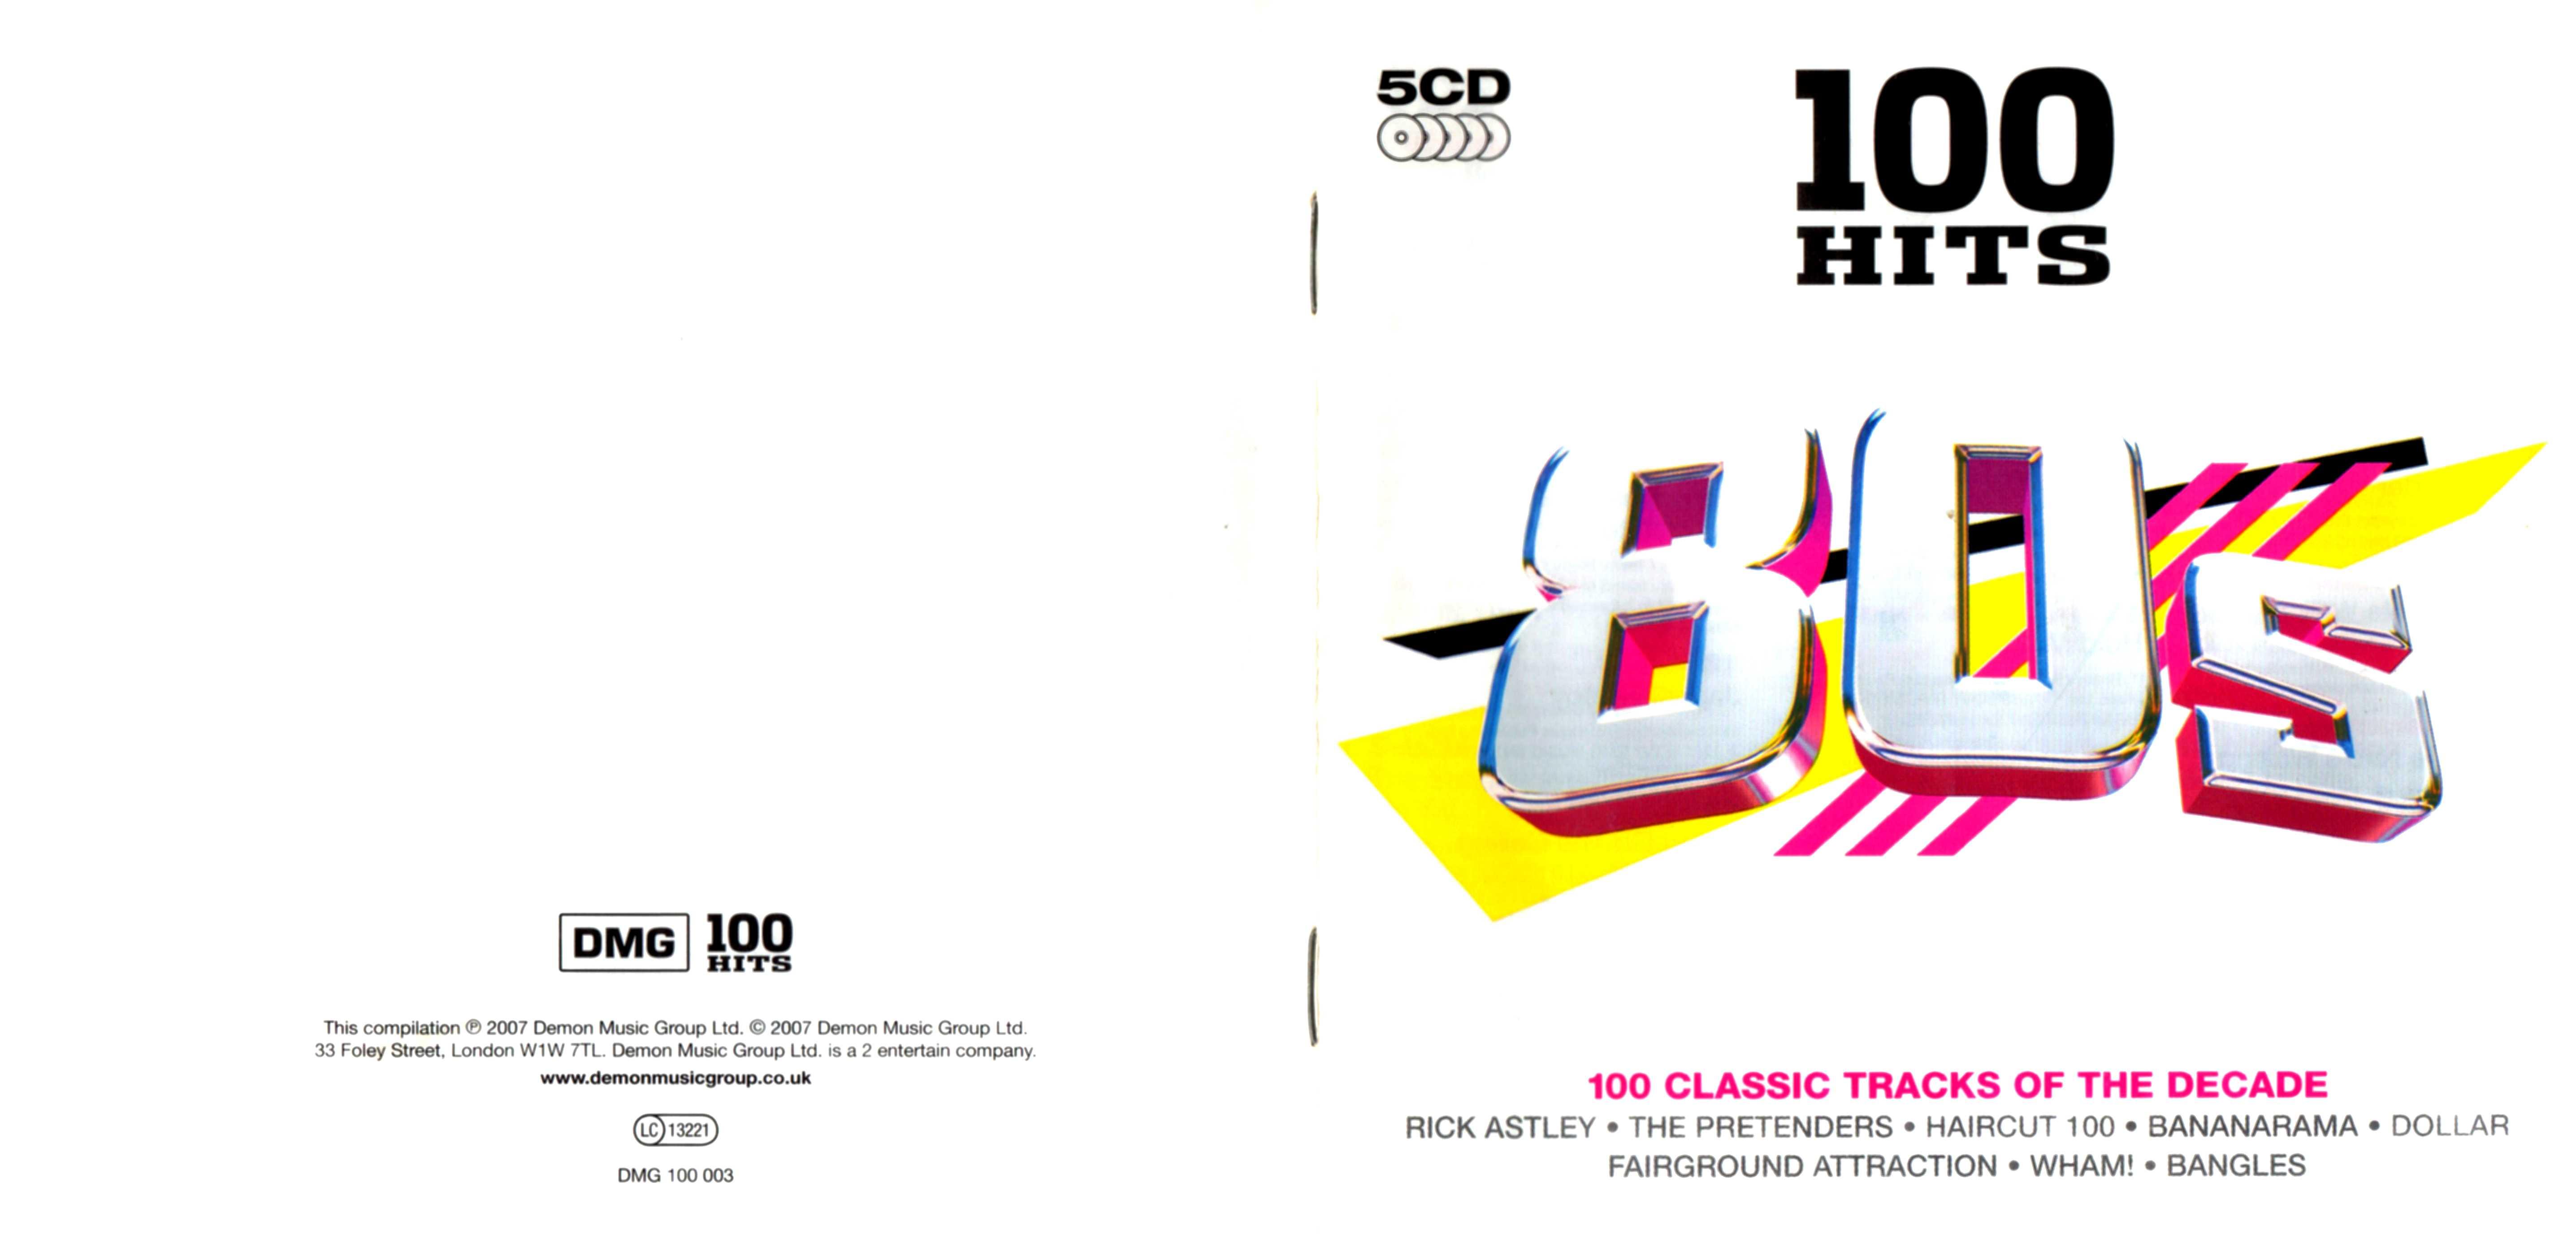 COVERS BOX SK ::: 100 hits - 80s [2007] pt1 - high quality DVD